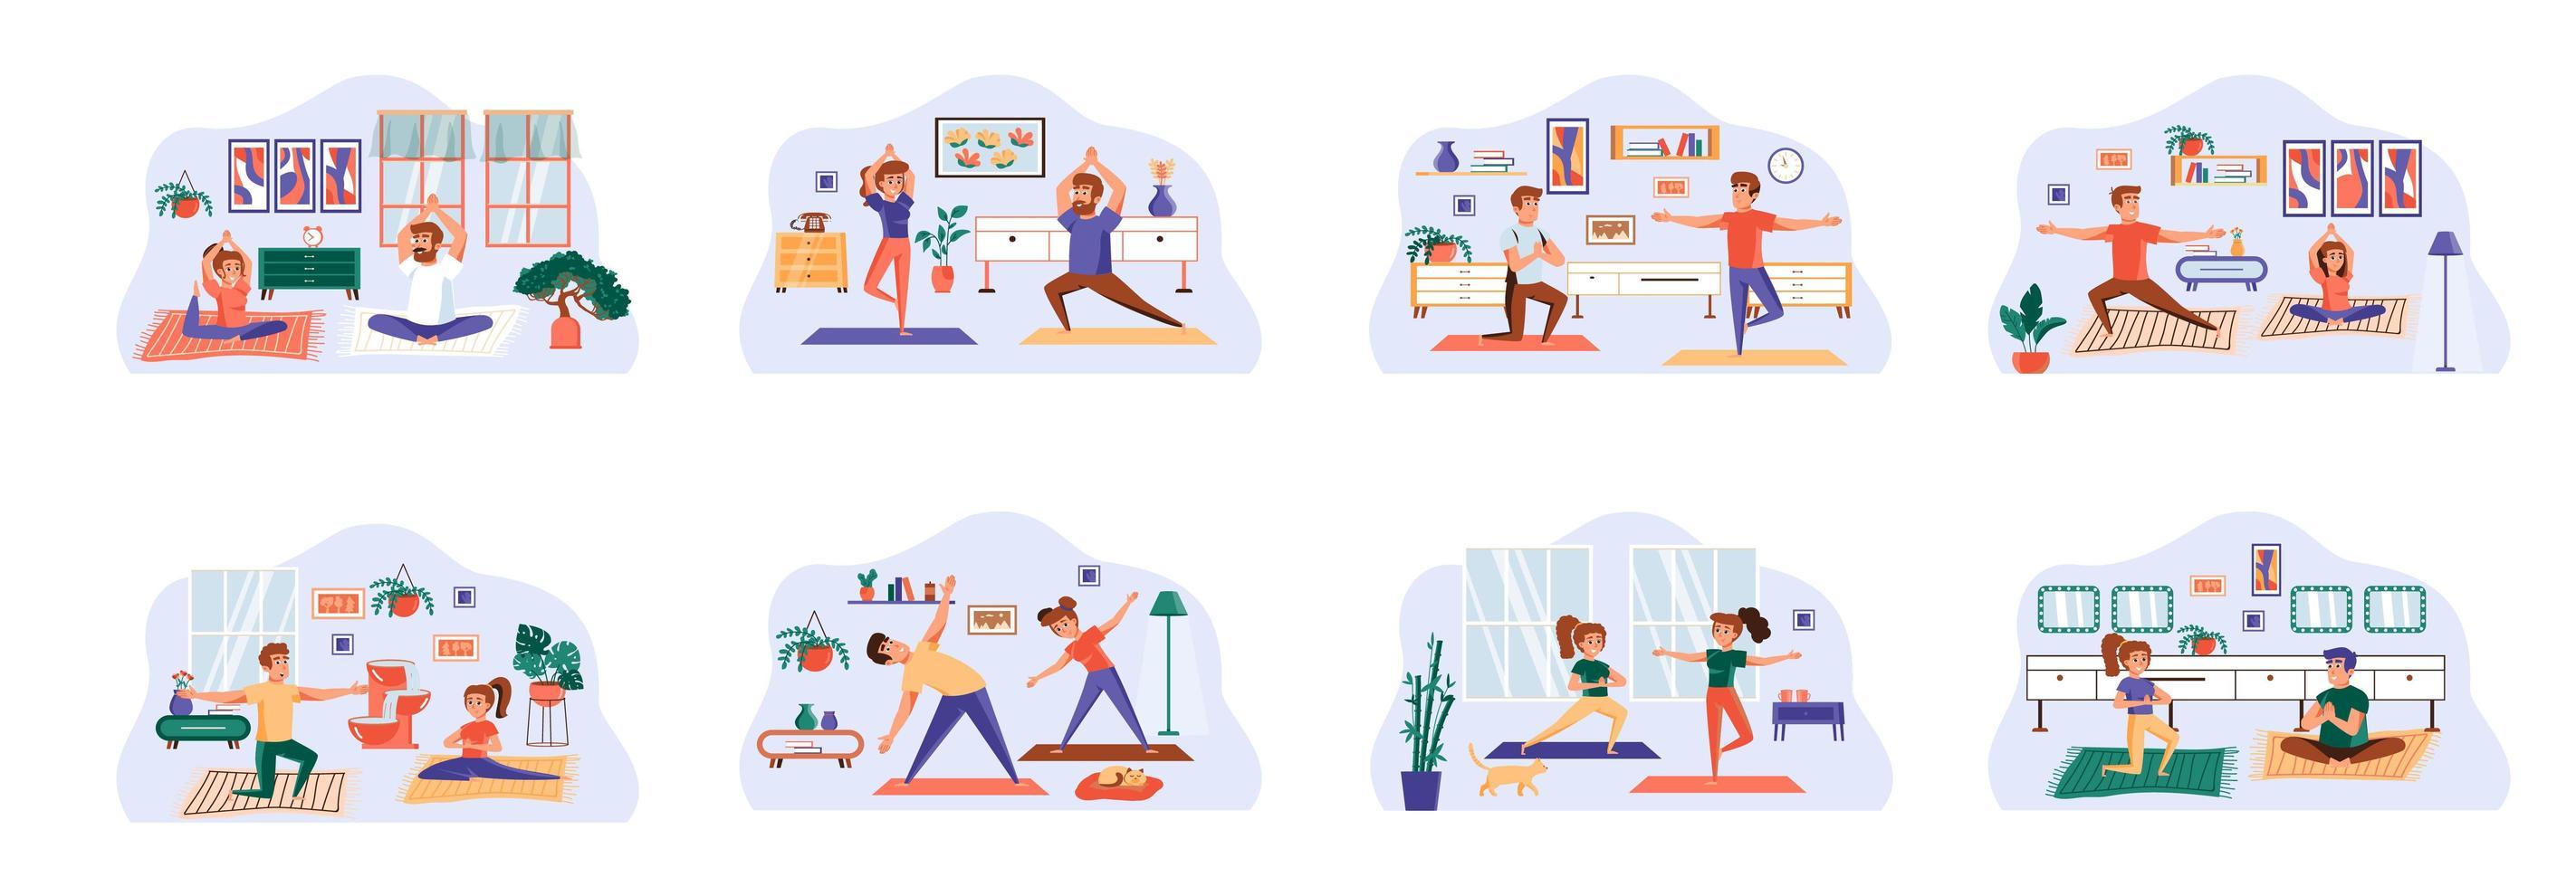 Yoga-Bündel von Szenen mit flachen Personencharakteren. vektor